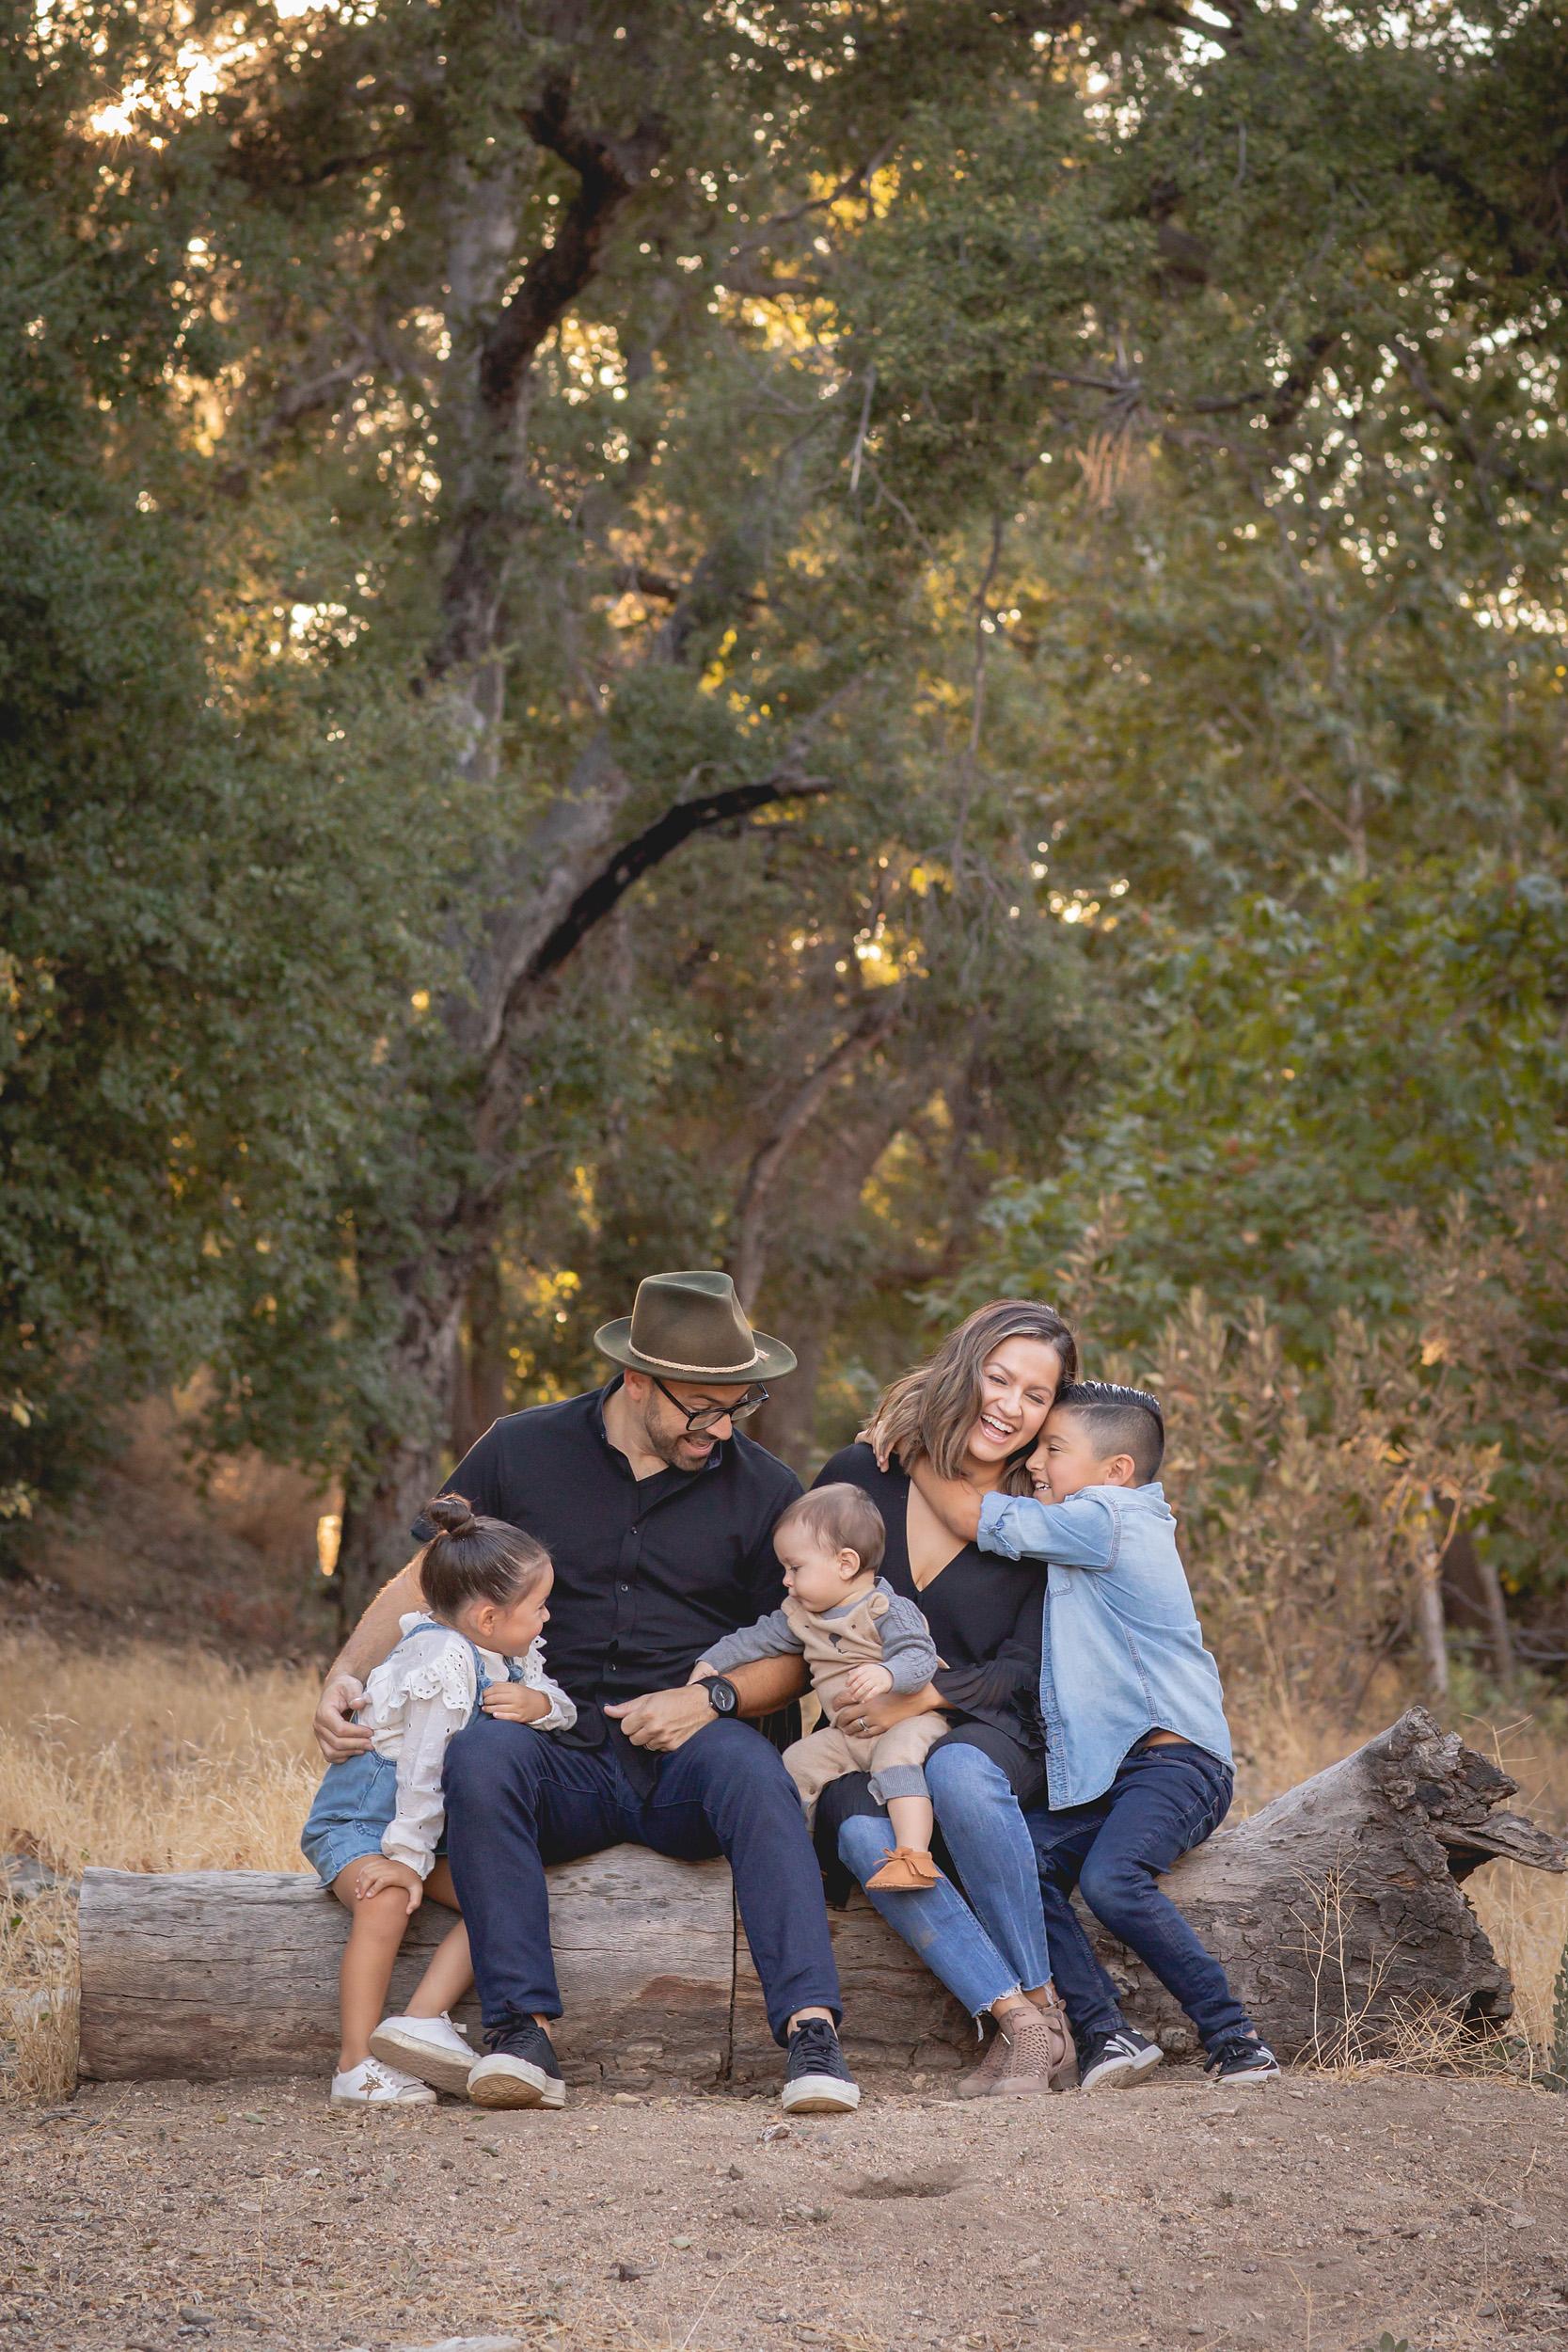 Castellon Family - 1549 - 955 - 20180915 - Scott Madrigal Photography.jpg